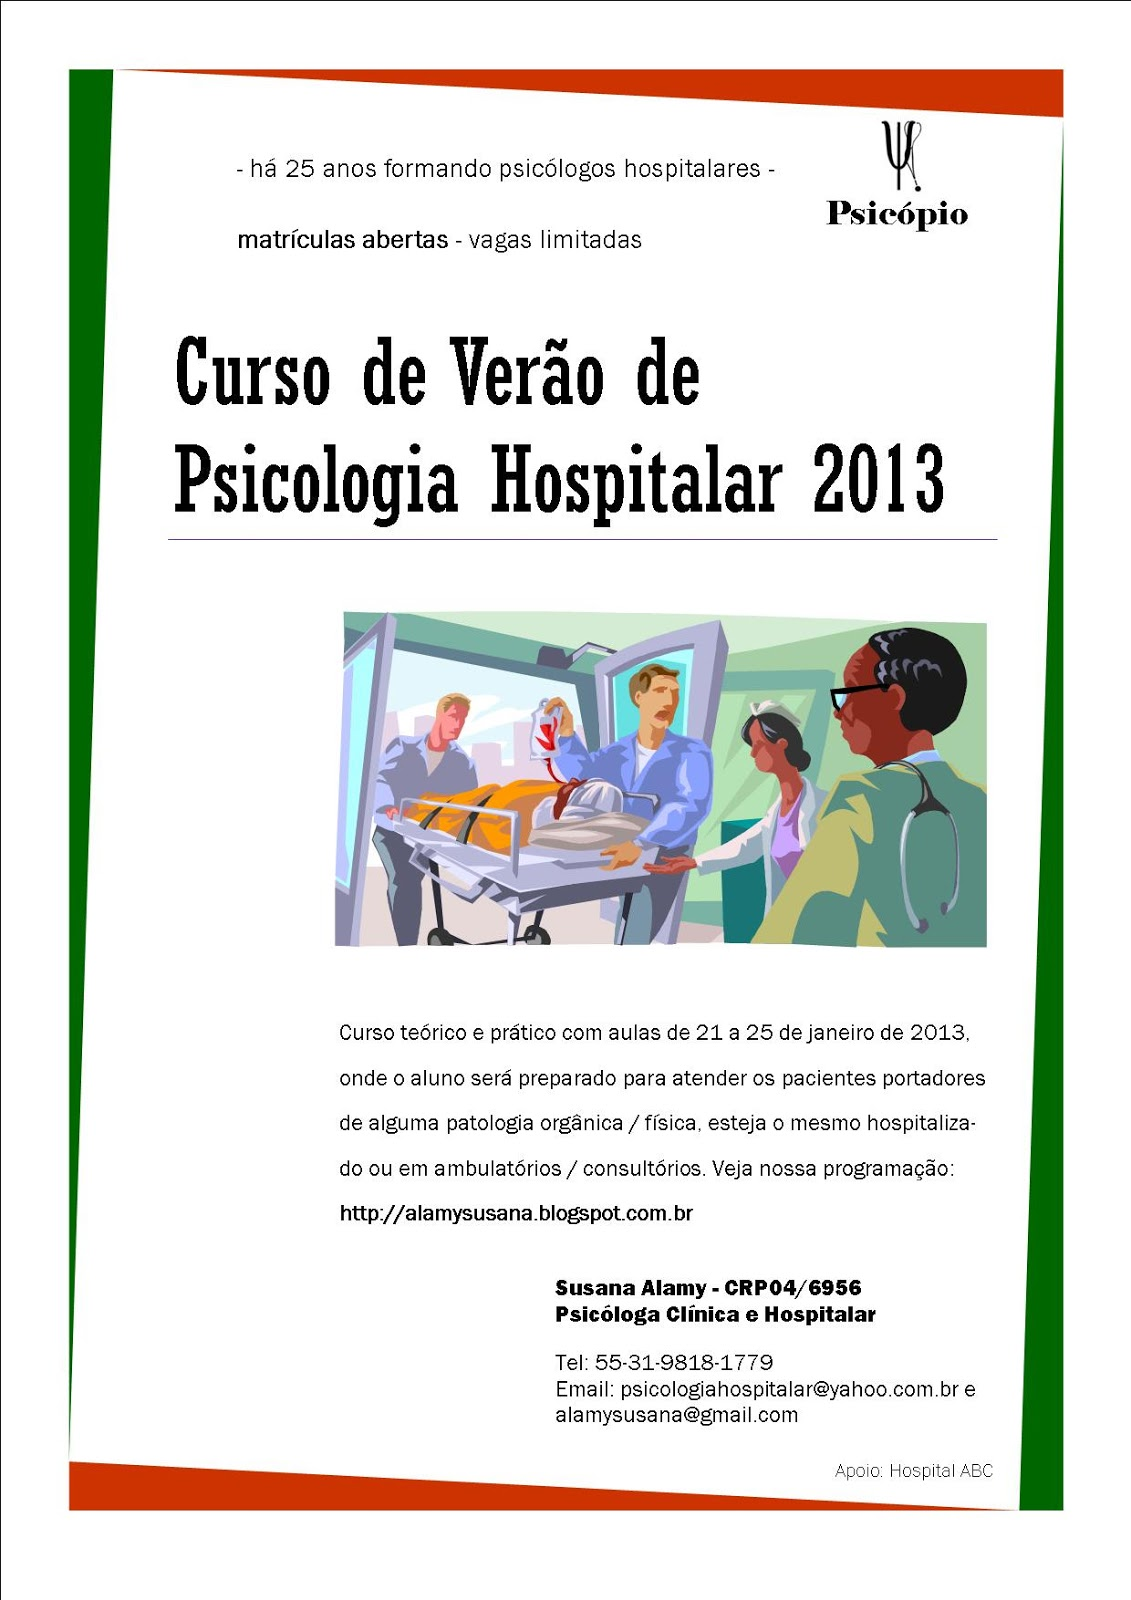 Curso psicologia hospitalar